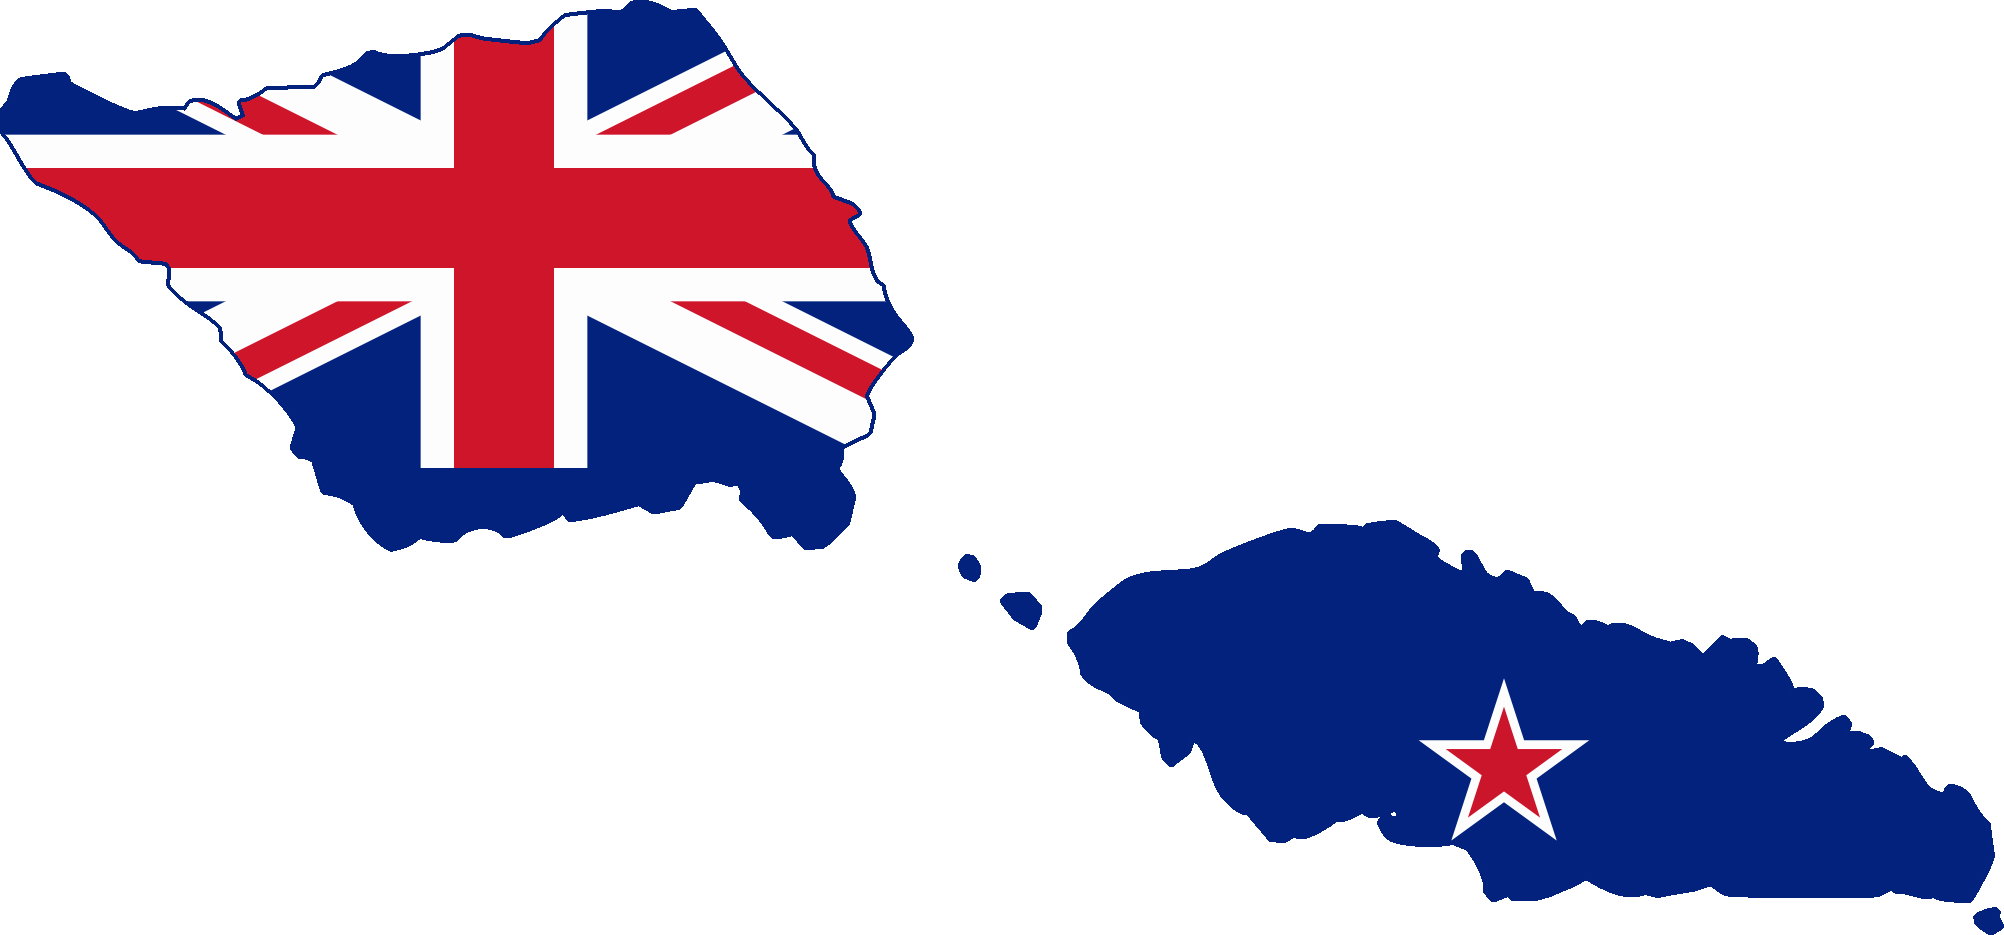 FileFlag Map Of Western Samoa New Zealand Mandatepng - New zealand map png